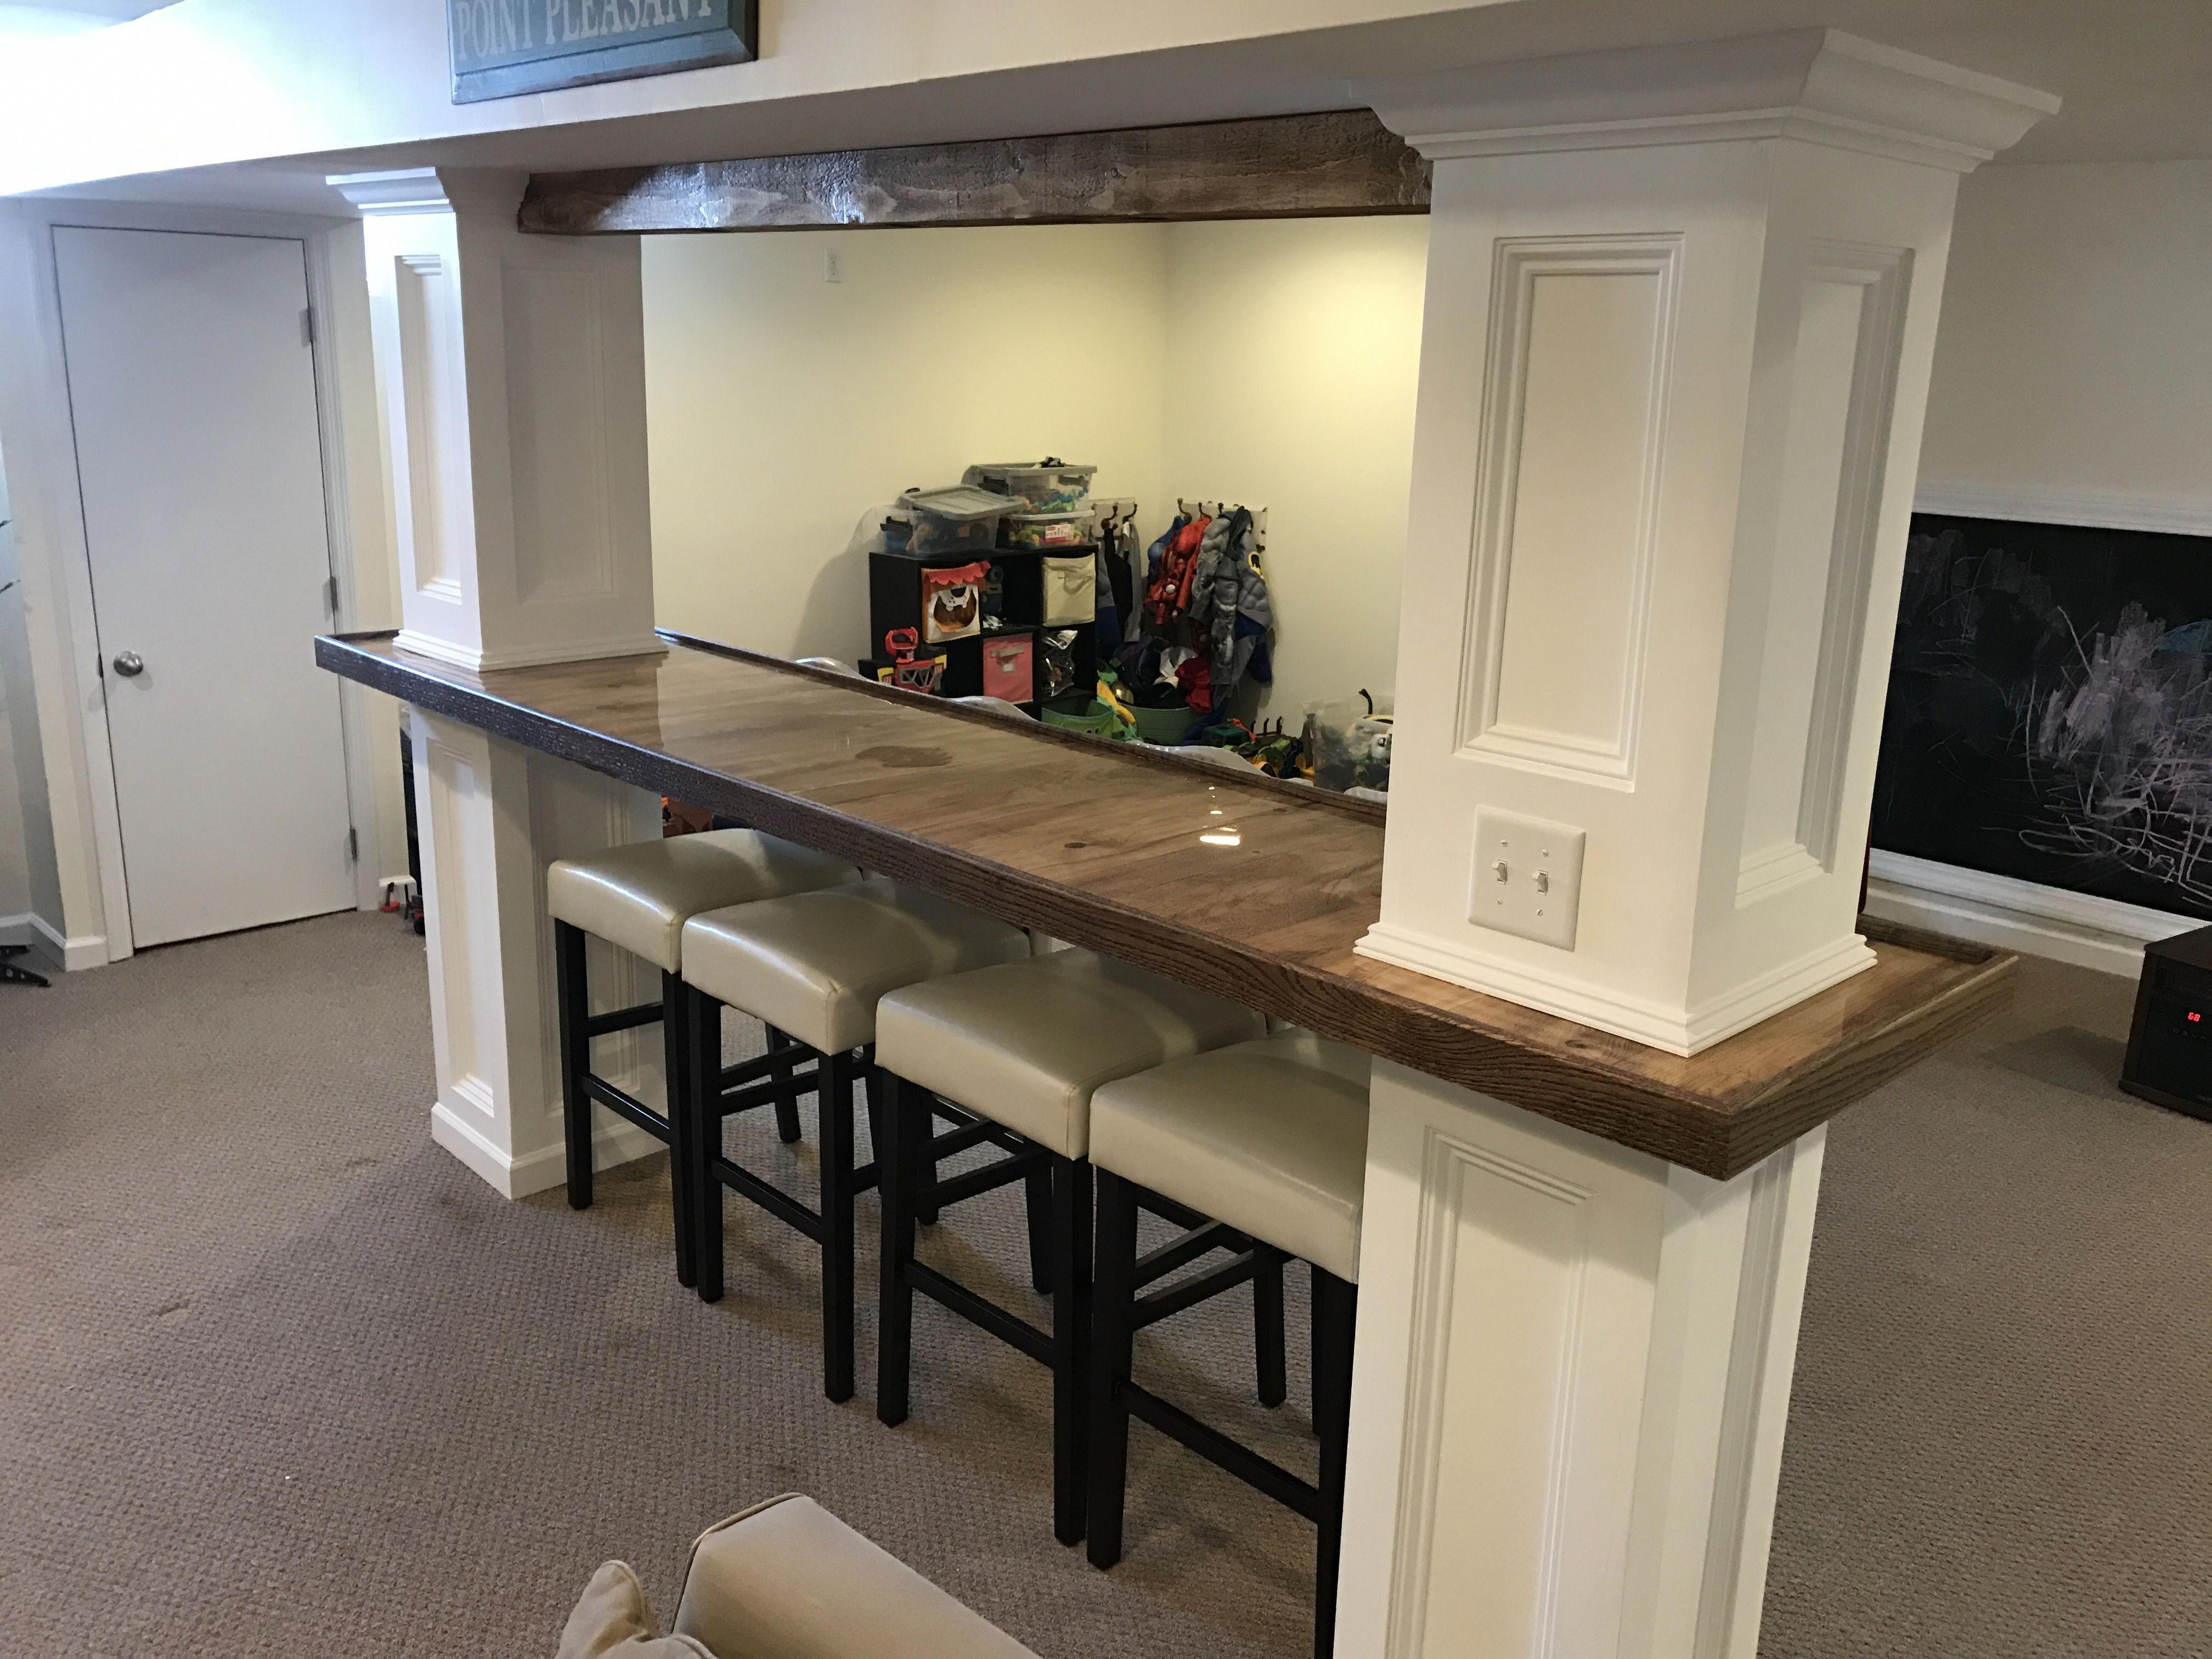 Basement ceiling ideas on a budget basement lounge ideas